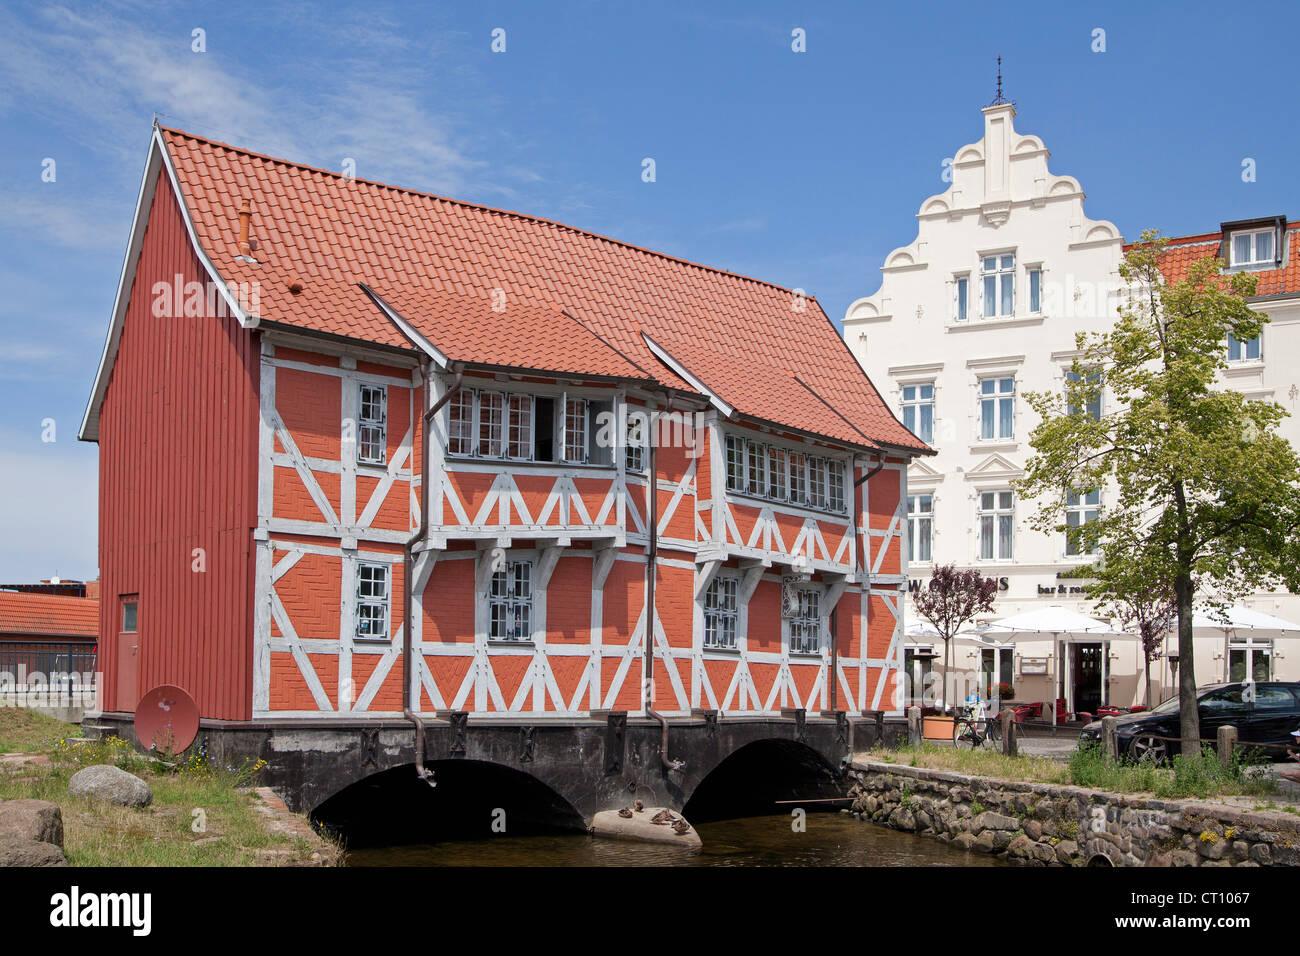 frame house called Gewoelbe built across River Grube, Wismar, Mecklenburg-West Pomerania, Germany Stock Photo